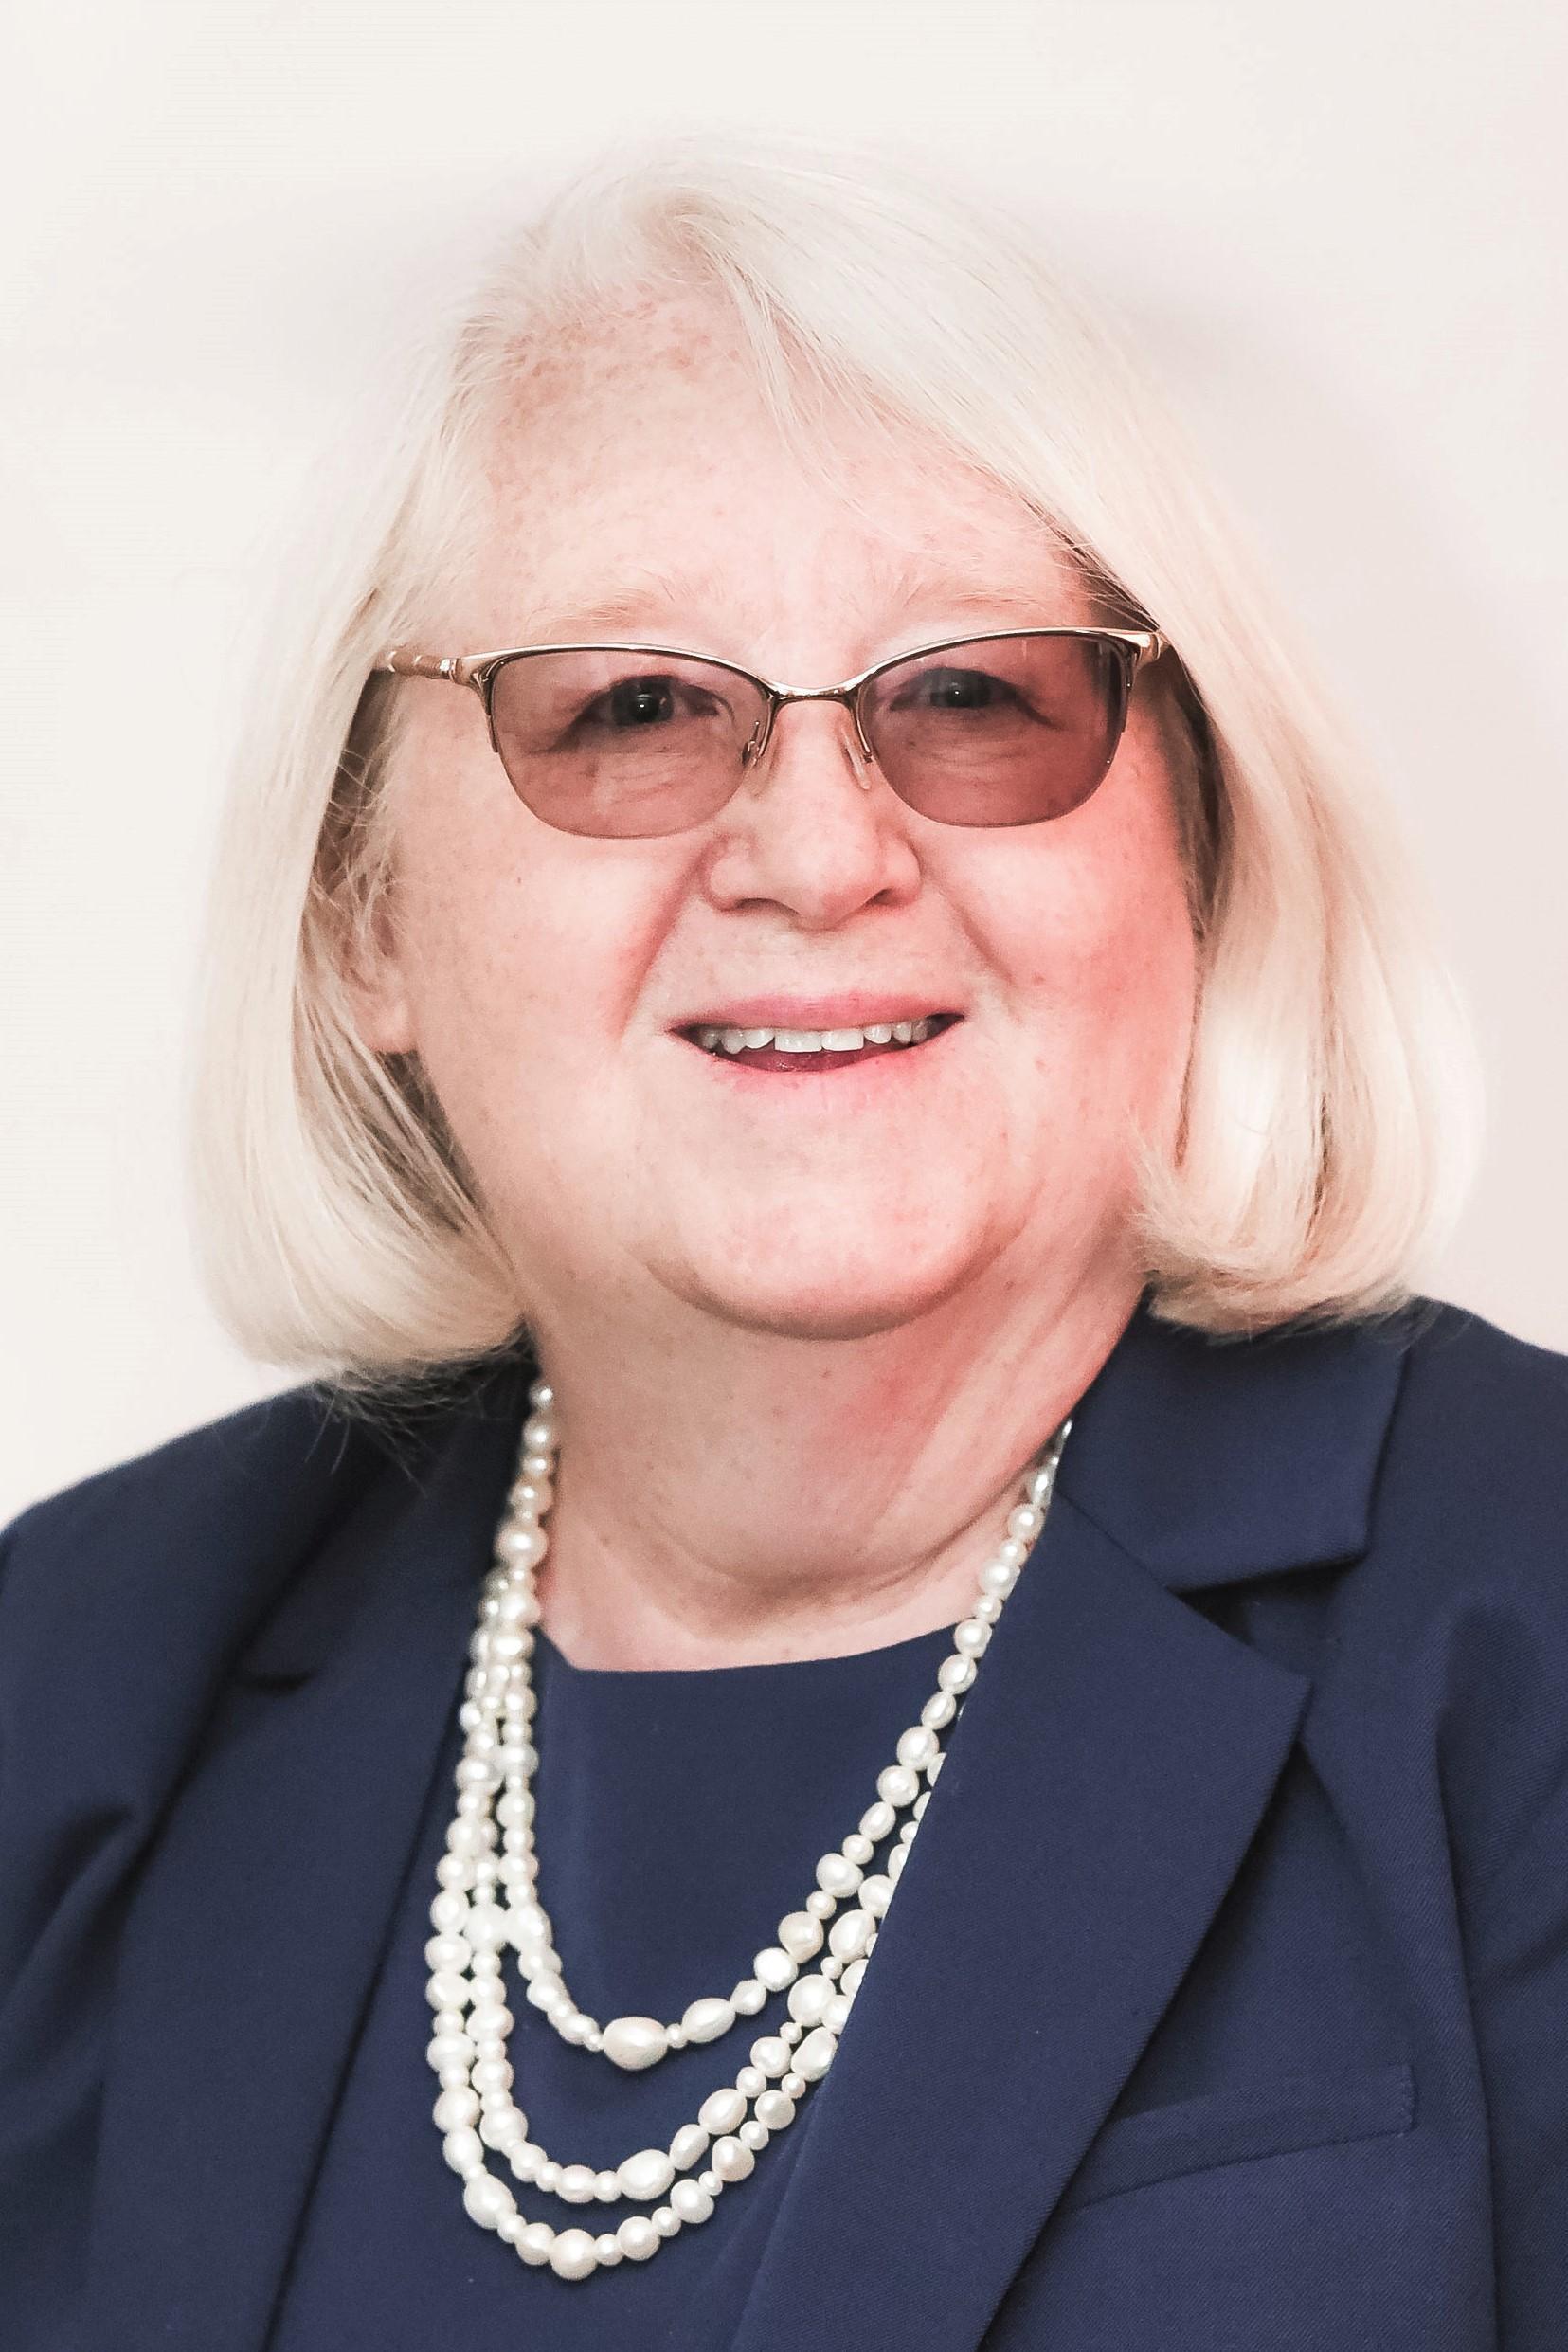 Cheryl Fentress Portrait Photo